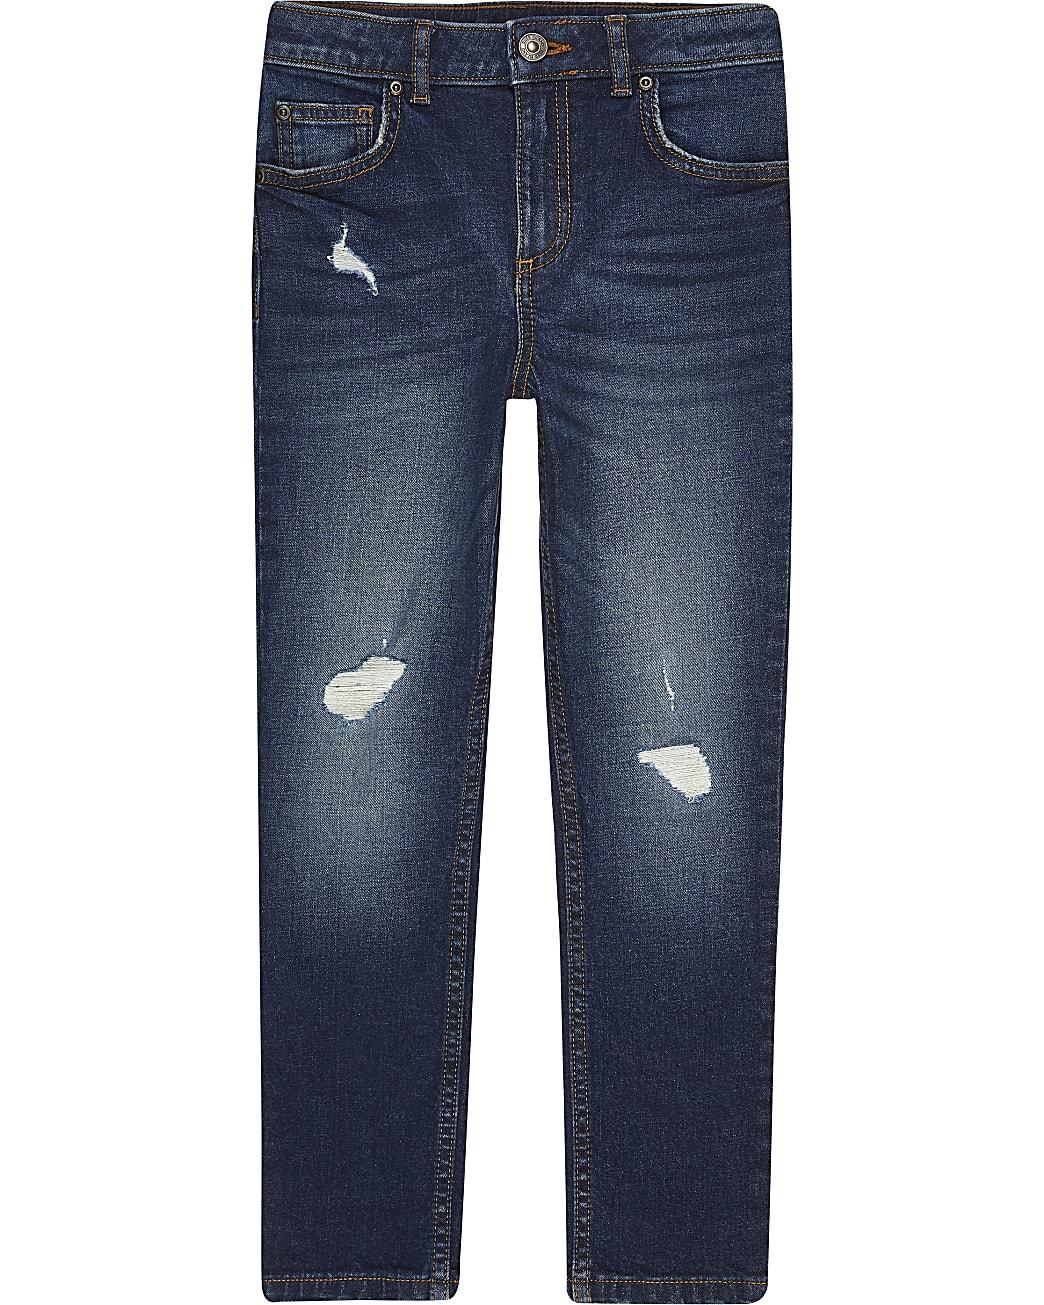 Boys dark blue ripped skinny jean